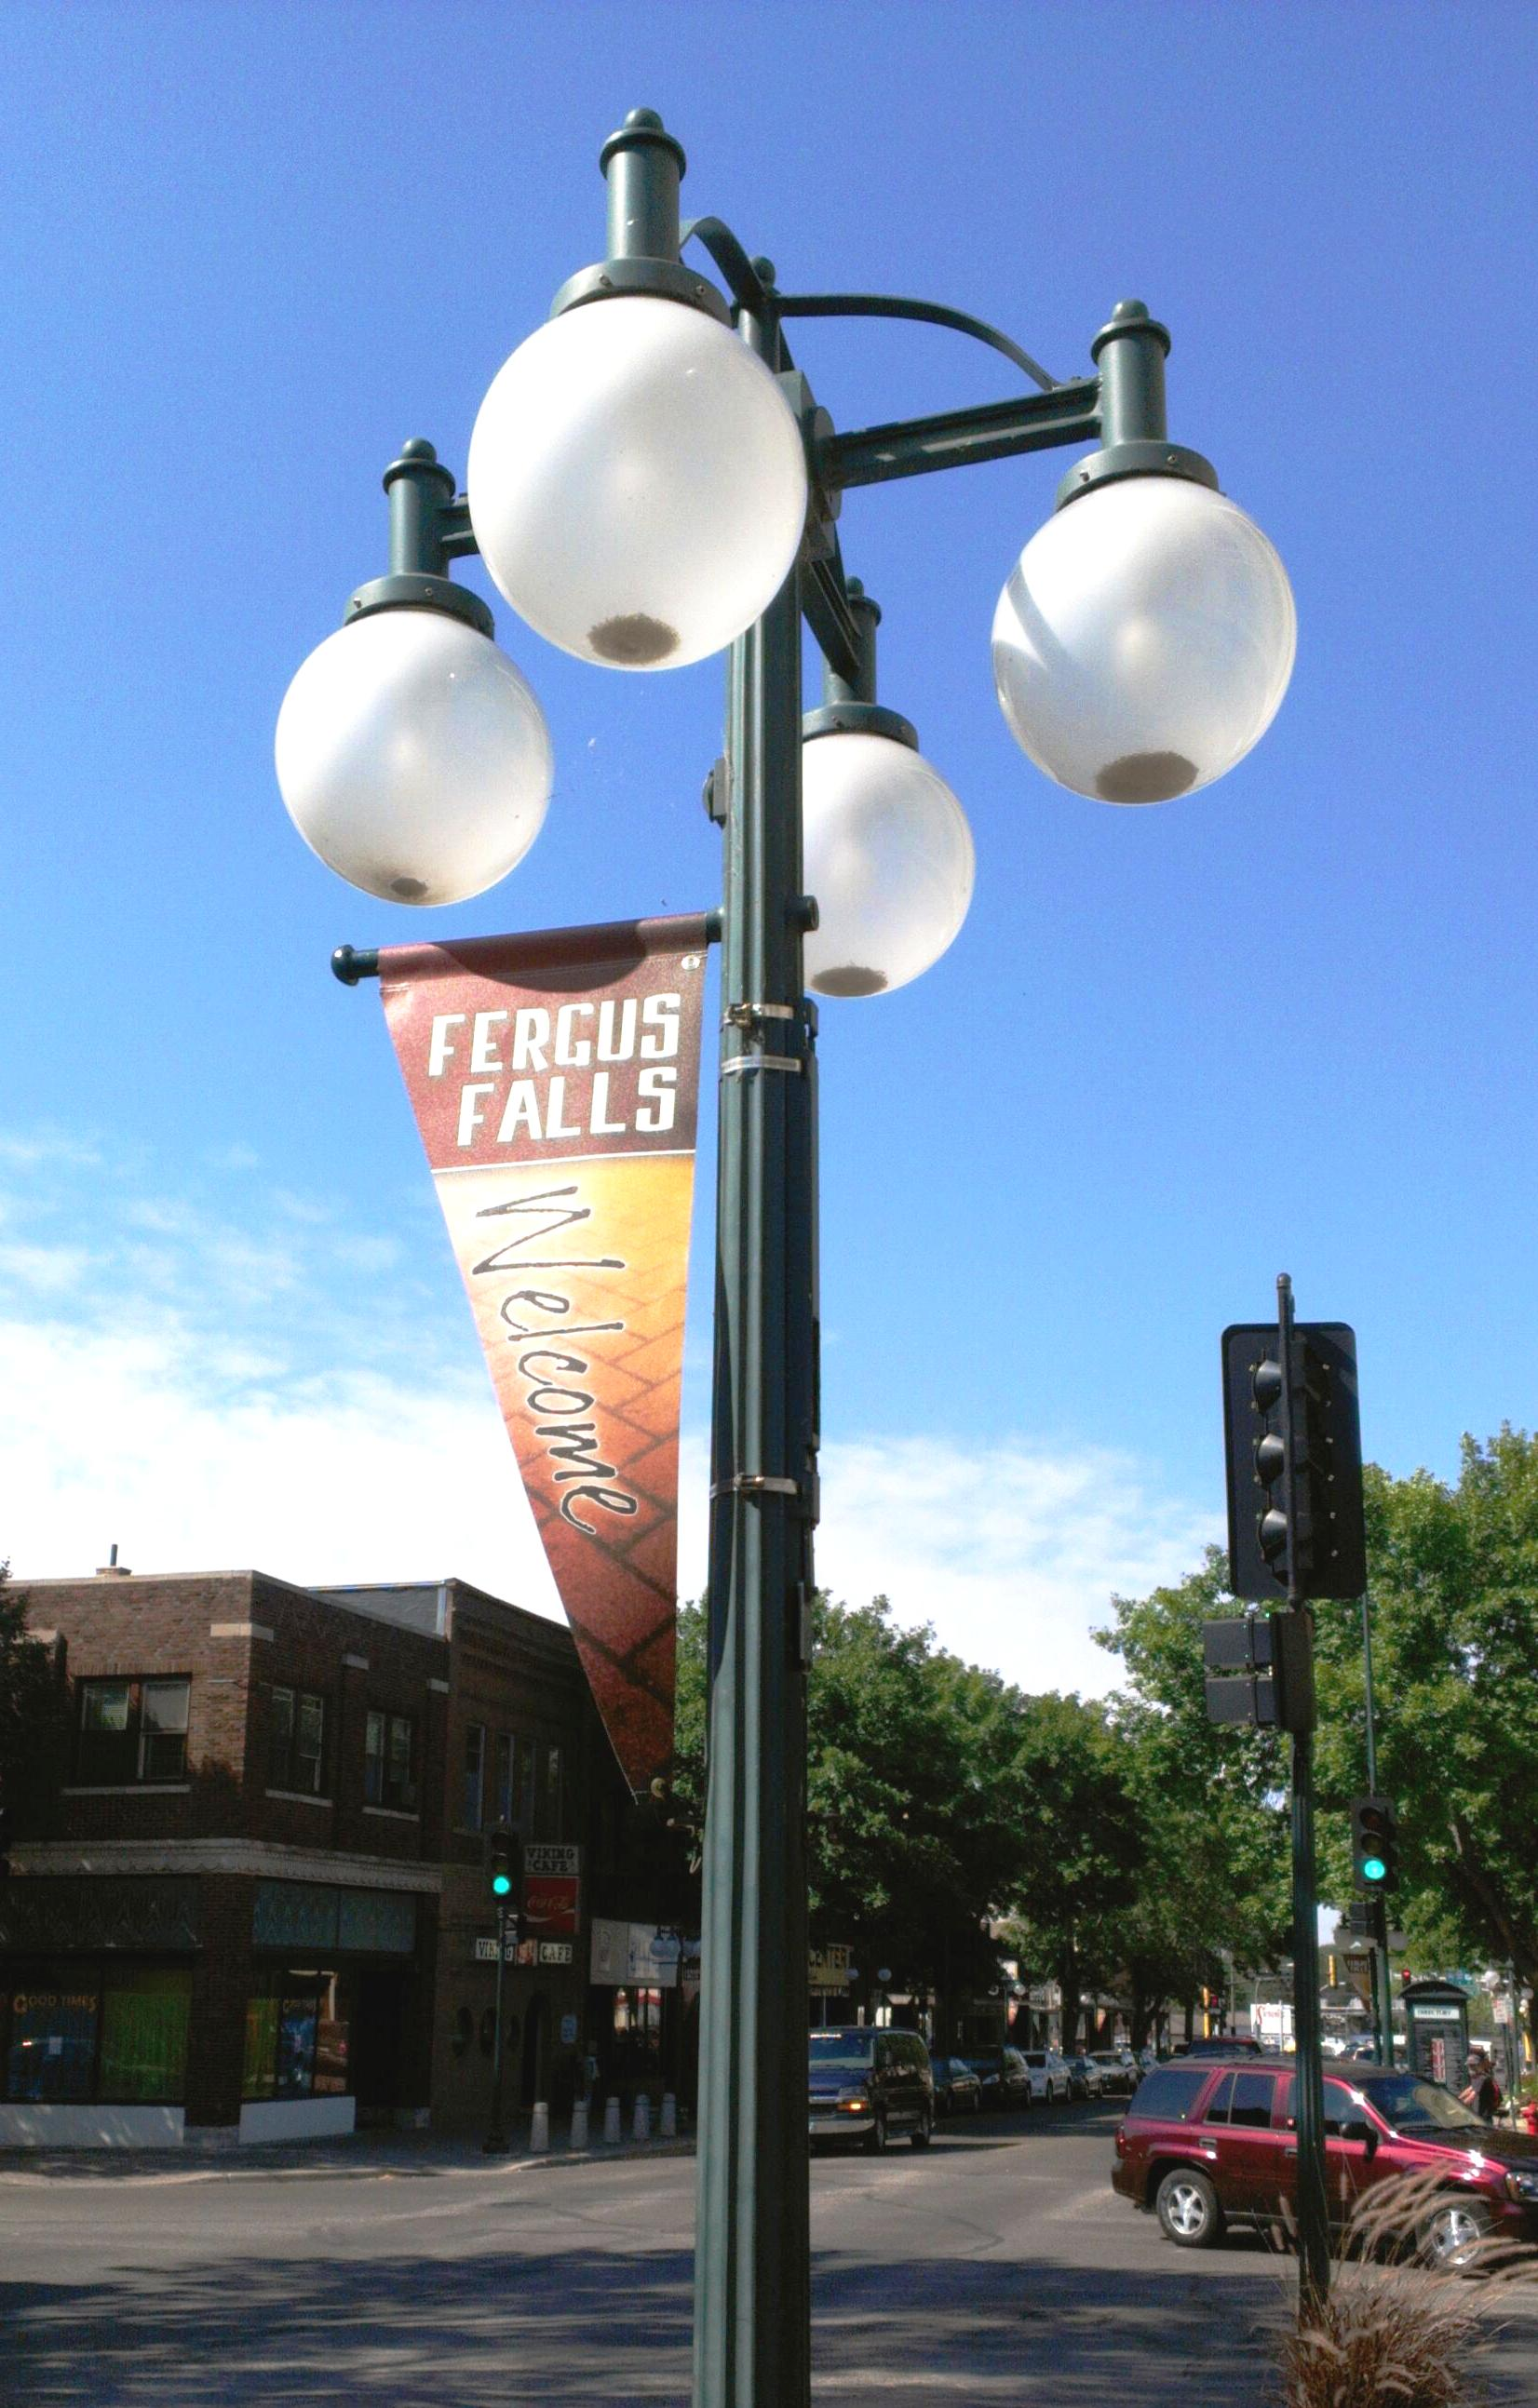 Downtown Fergus Falls, Minnesota